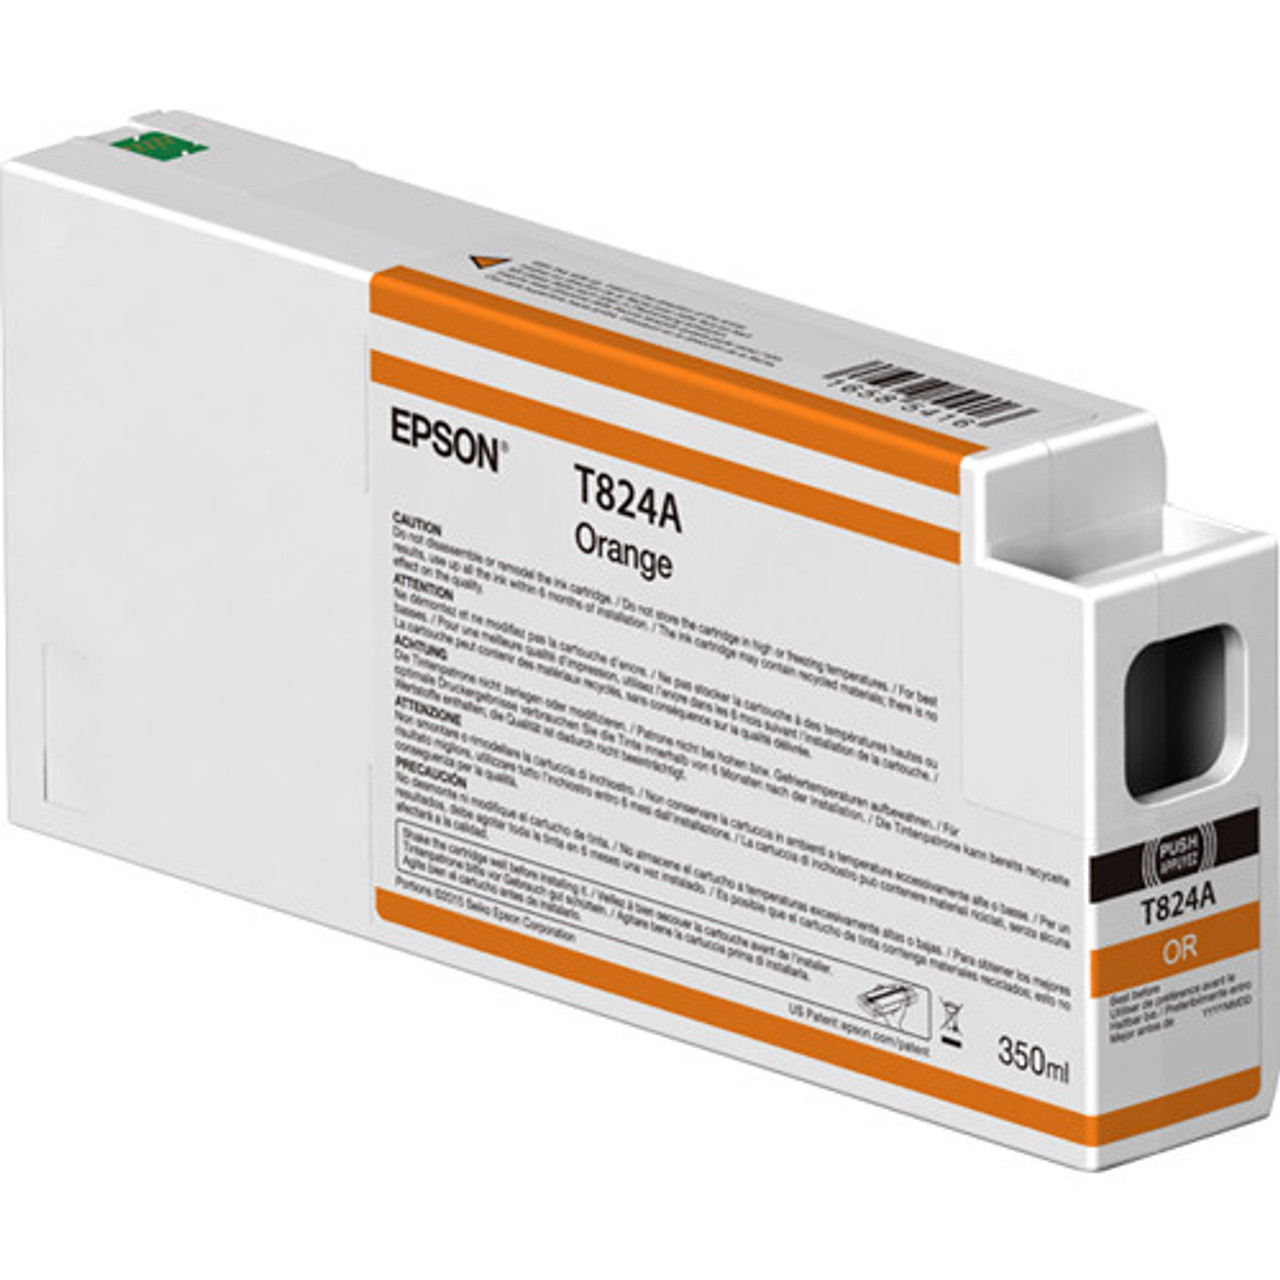 Epson T824A00 Orange Ink Cartridge, 350 mL